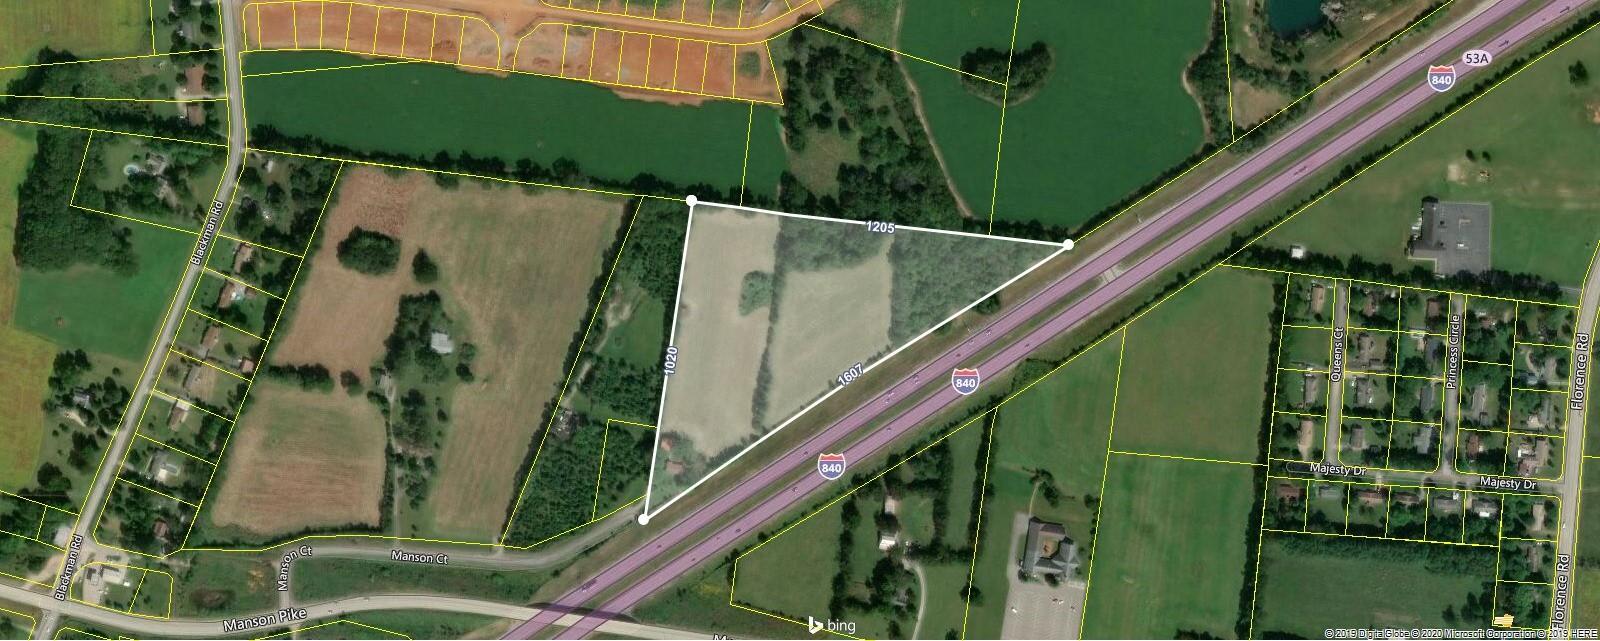 125 Manson Ct, Murfreesboro, TN 37129 - Murfreesboro, TN real estate listing